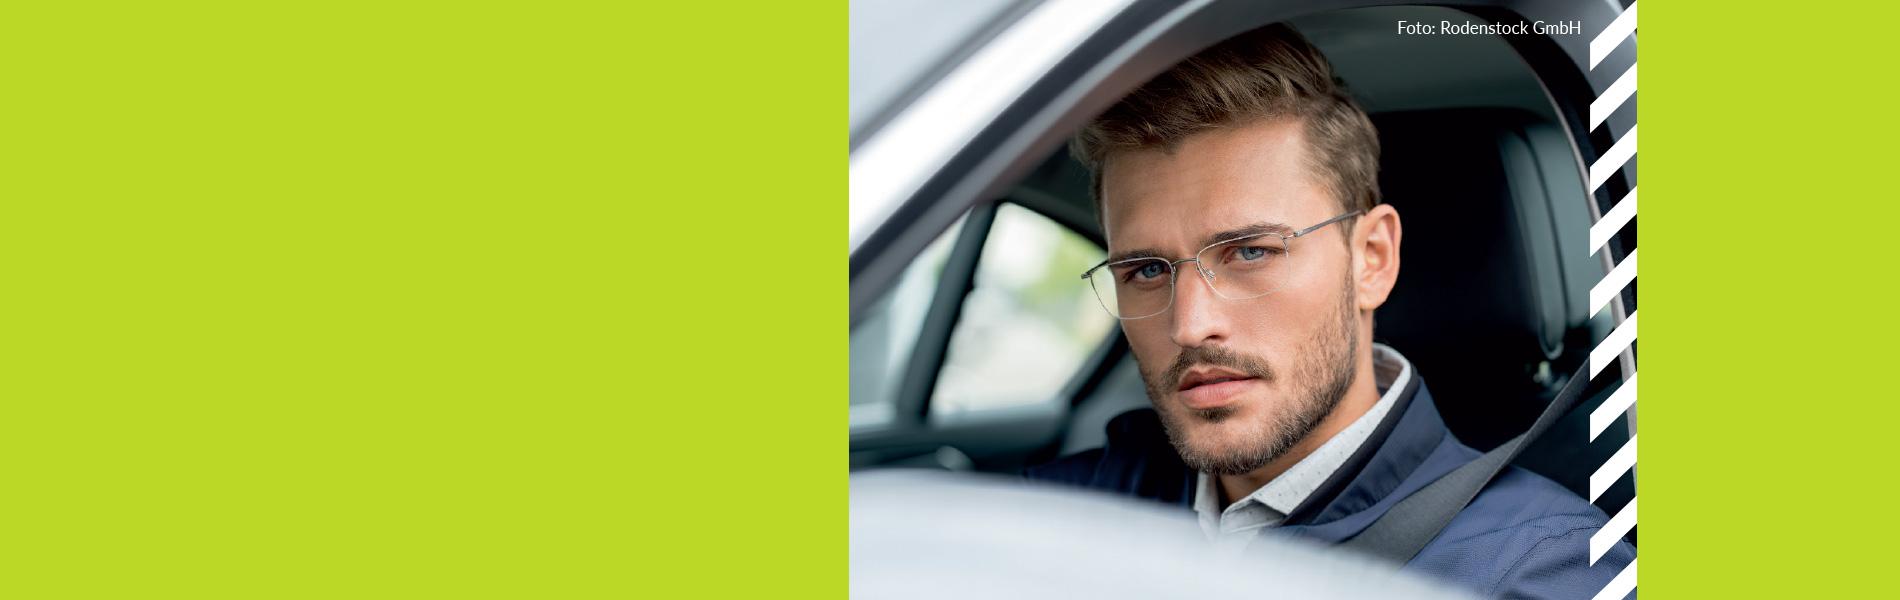 siegert_start_autofahrerbrille_2016_1